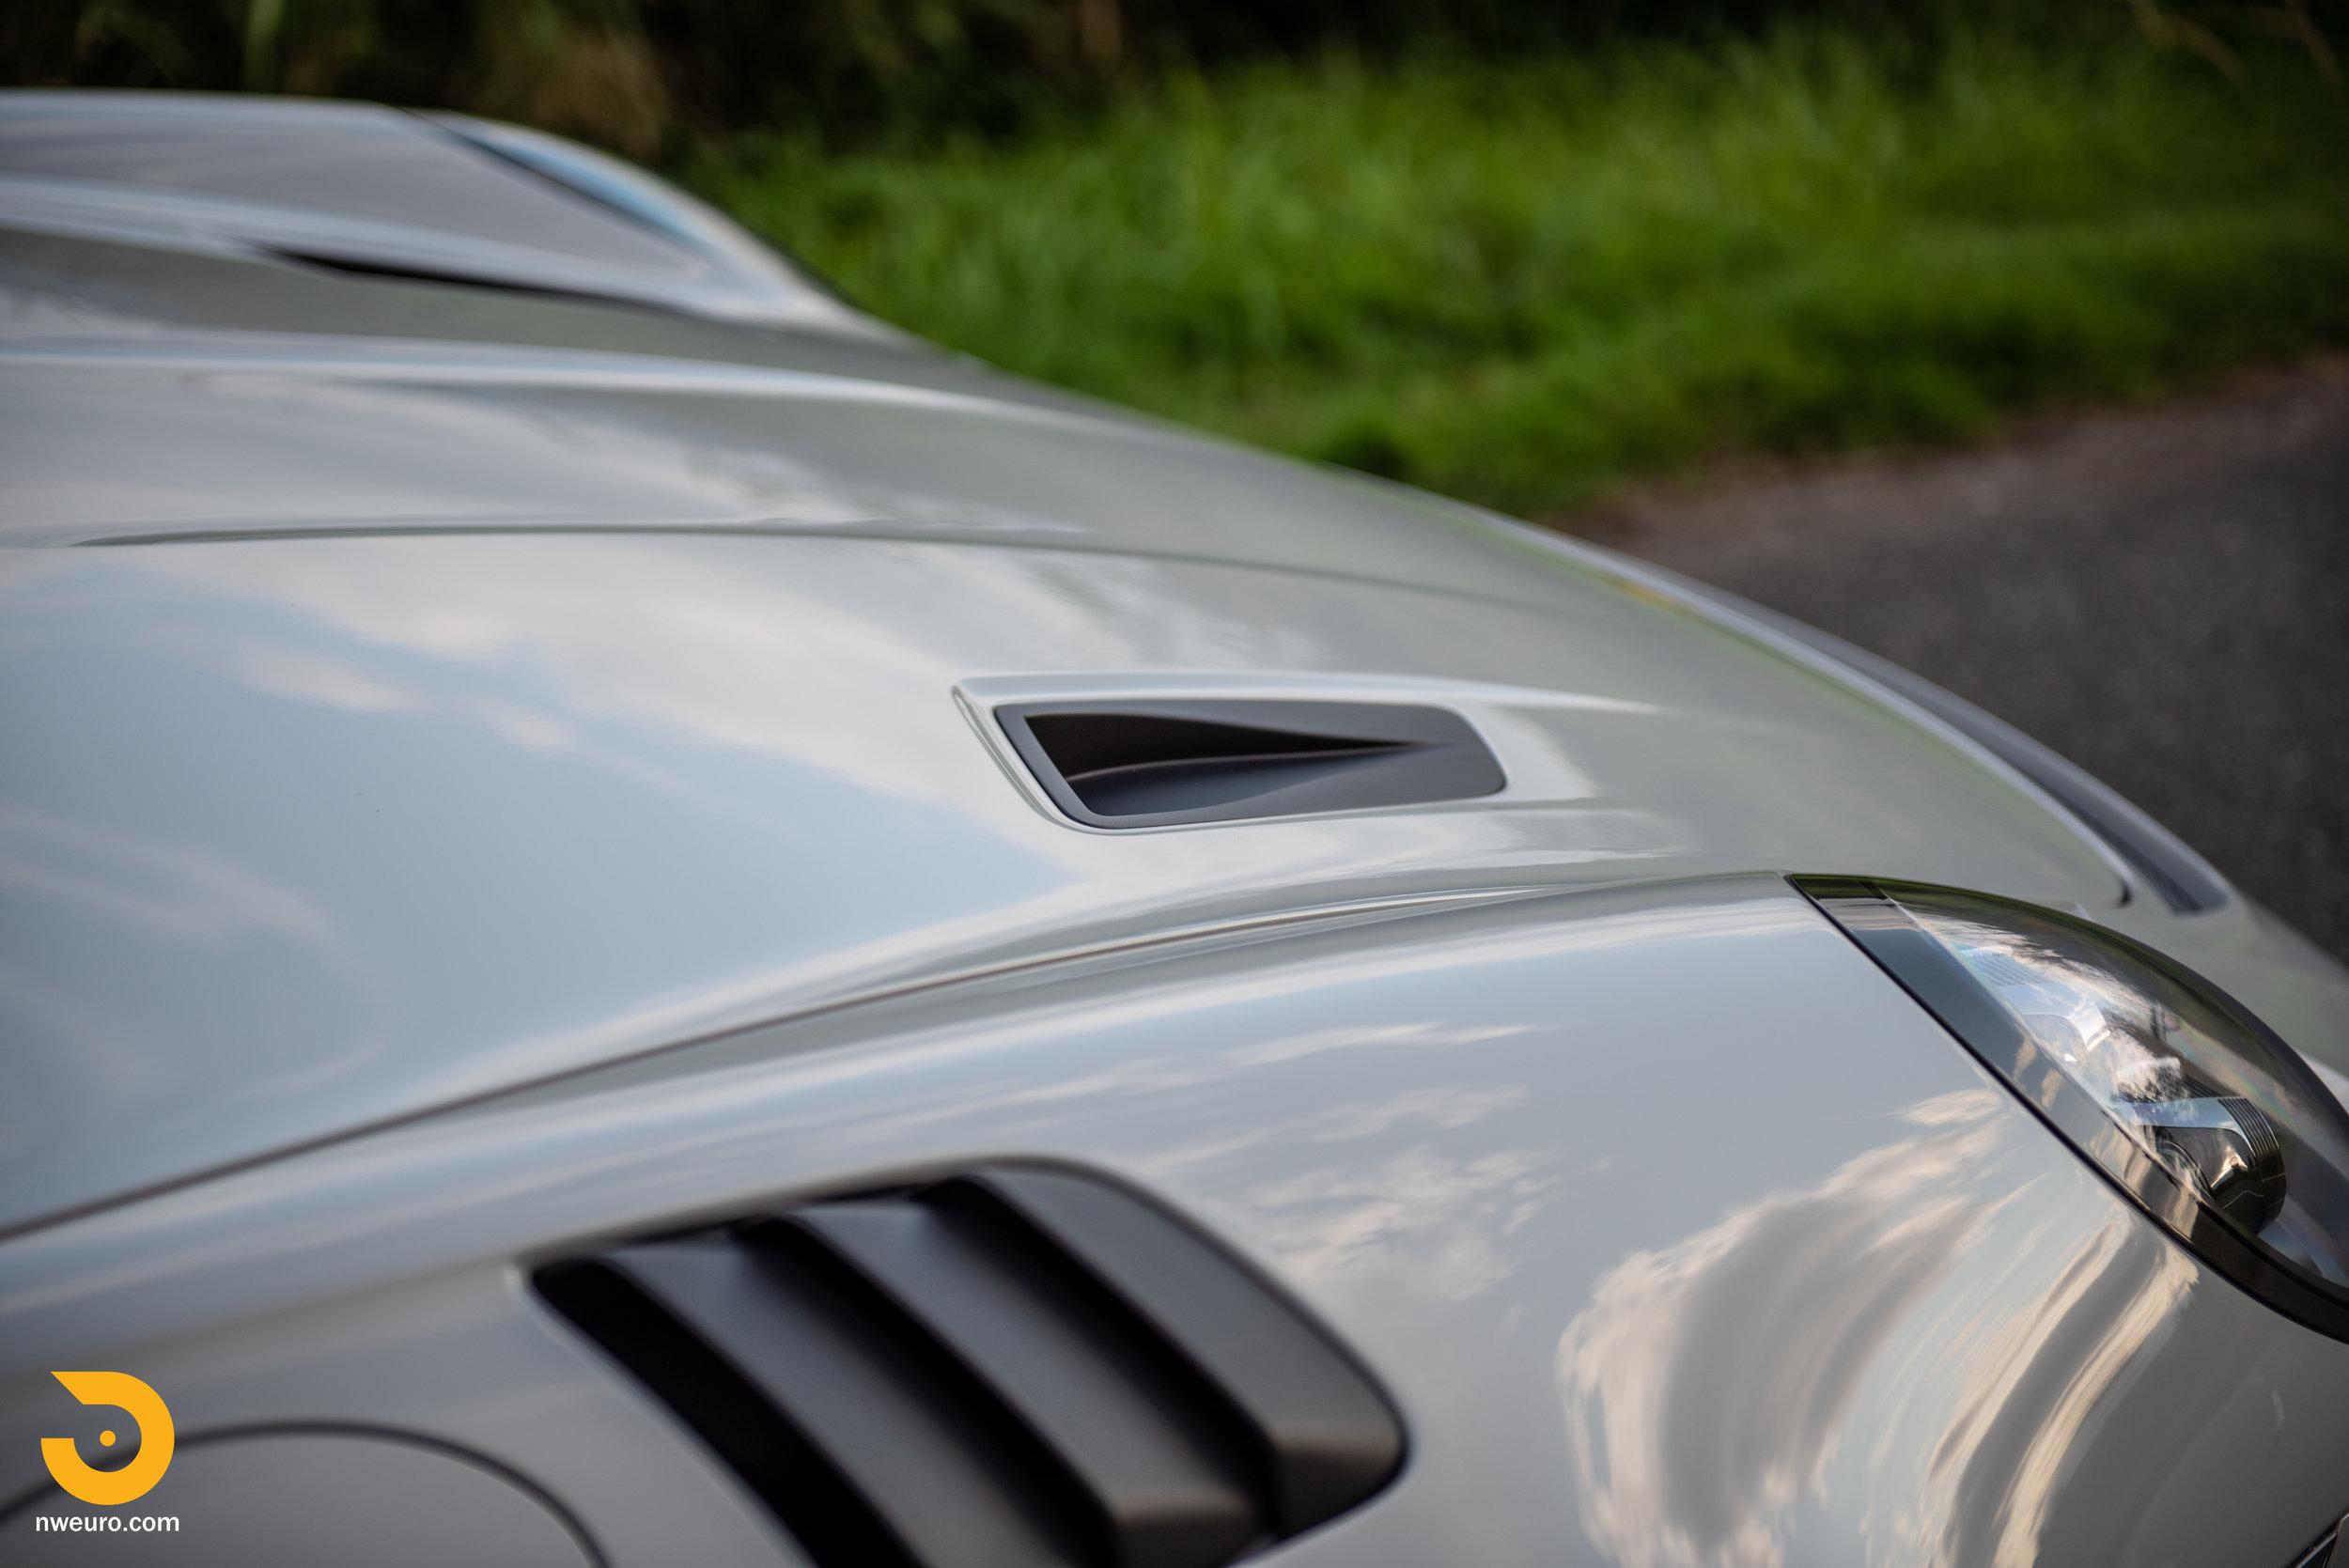 2019 Porsche GT3 RS - Chalk-68.jpg